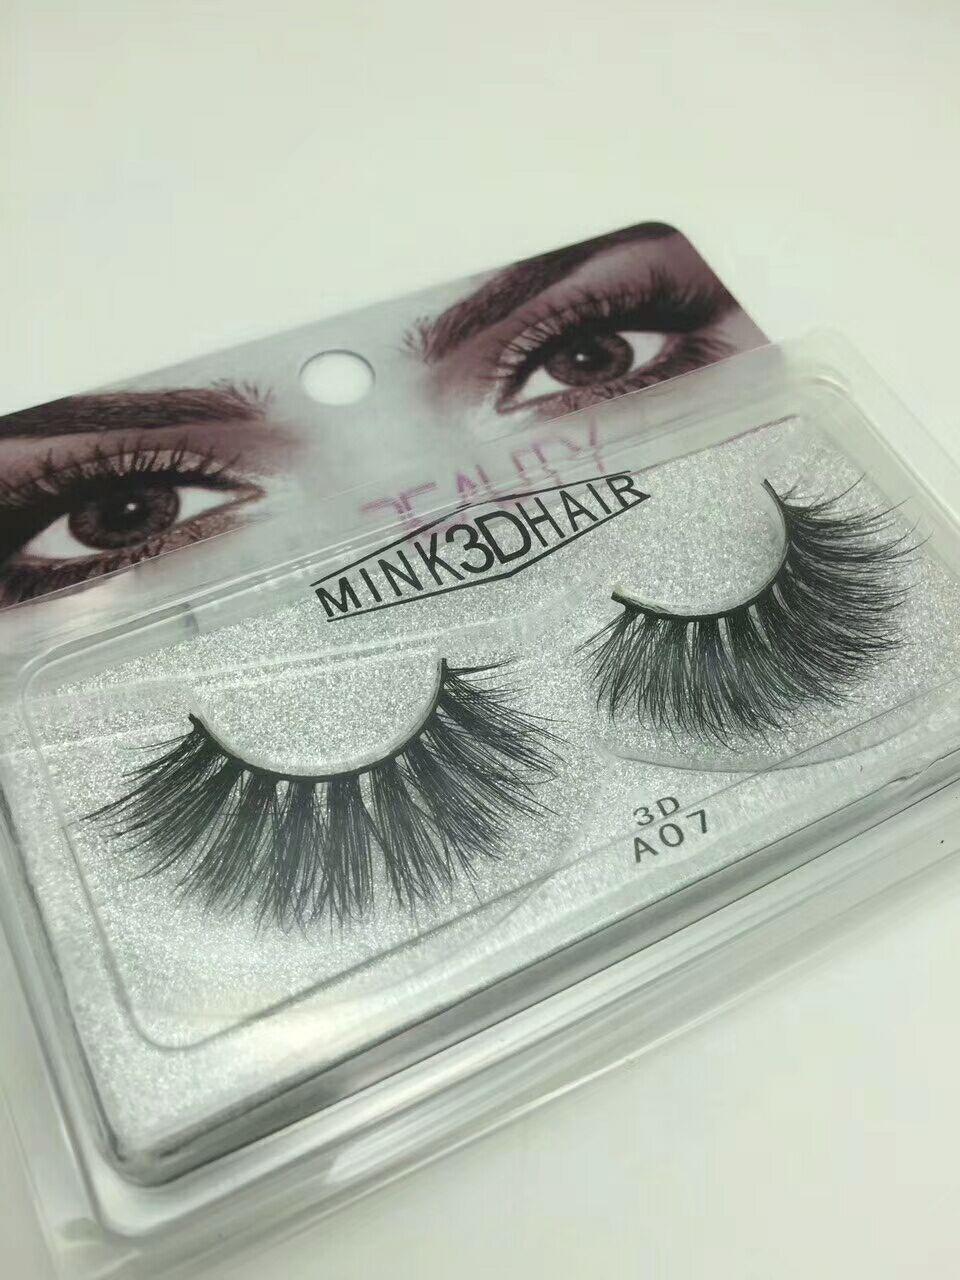 3d Mink lashes Fur Eyelashes Thick real mink HAIR false eyelashes natural for Beauty Makeup Extension fake Eyelashes false lashes 8 STYLES